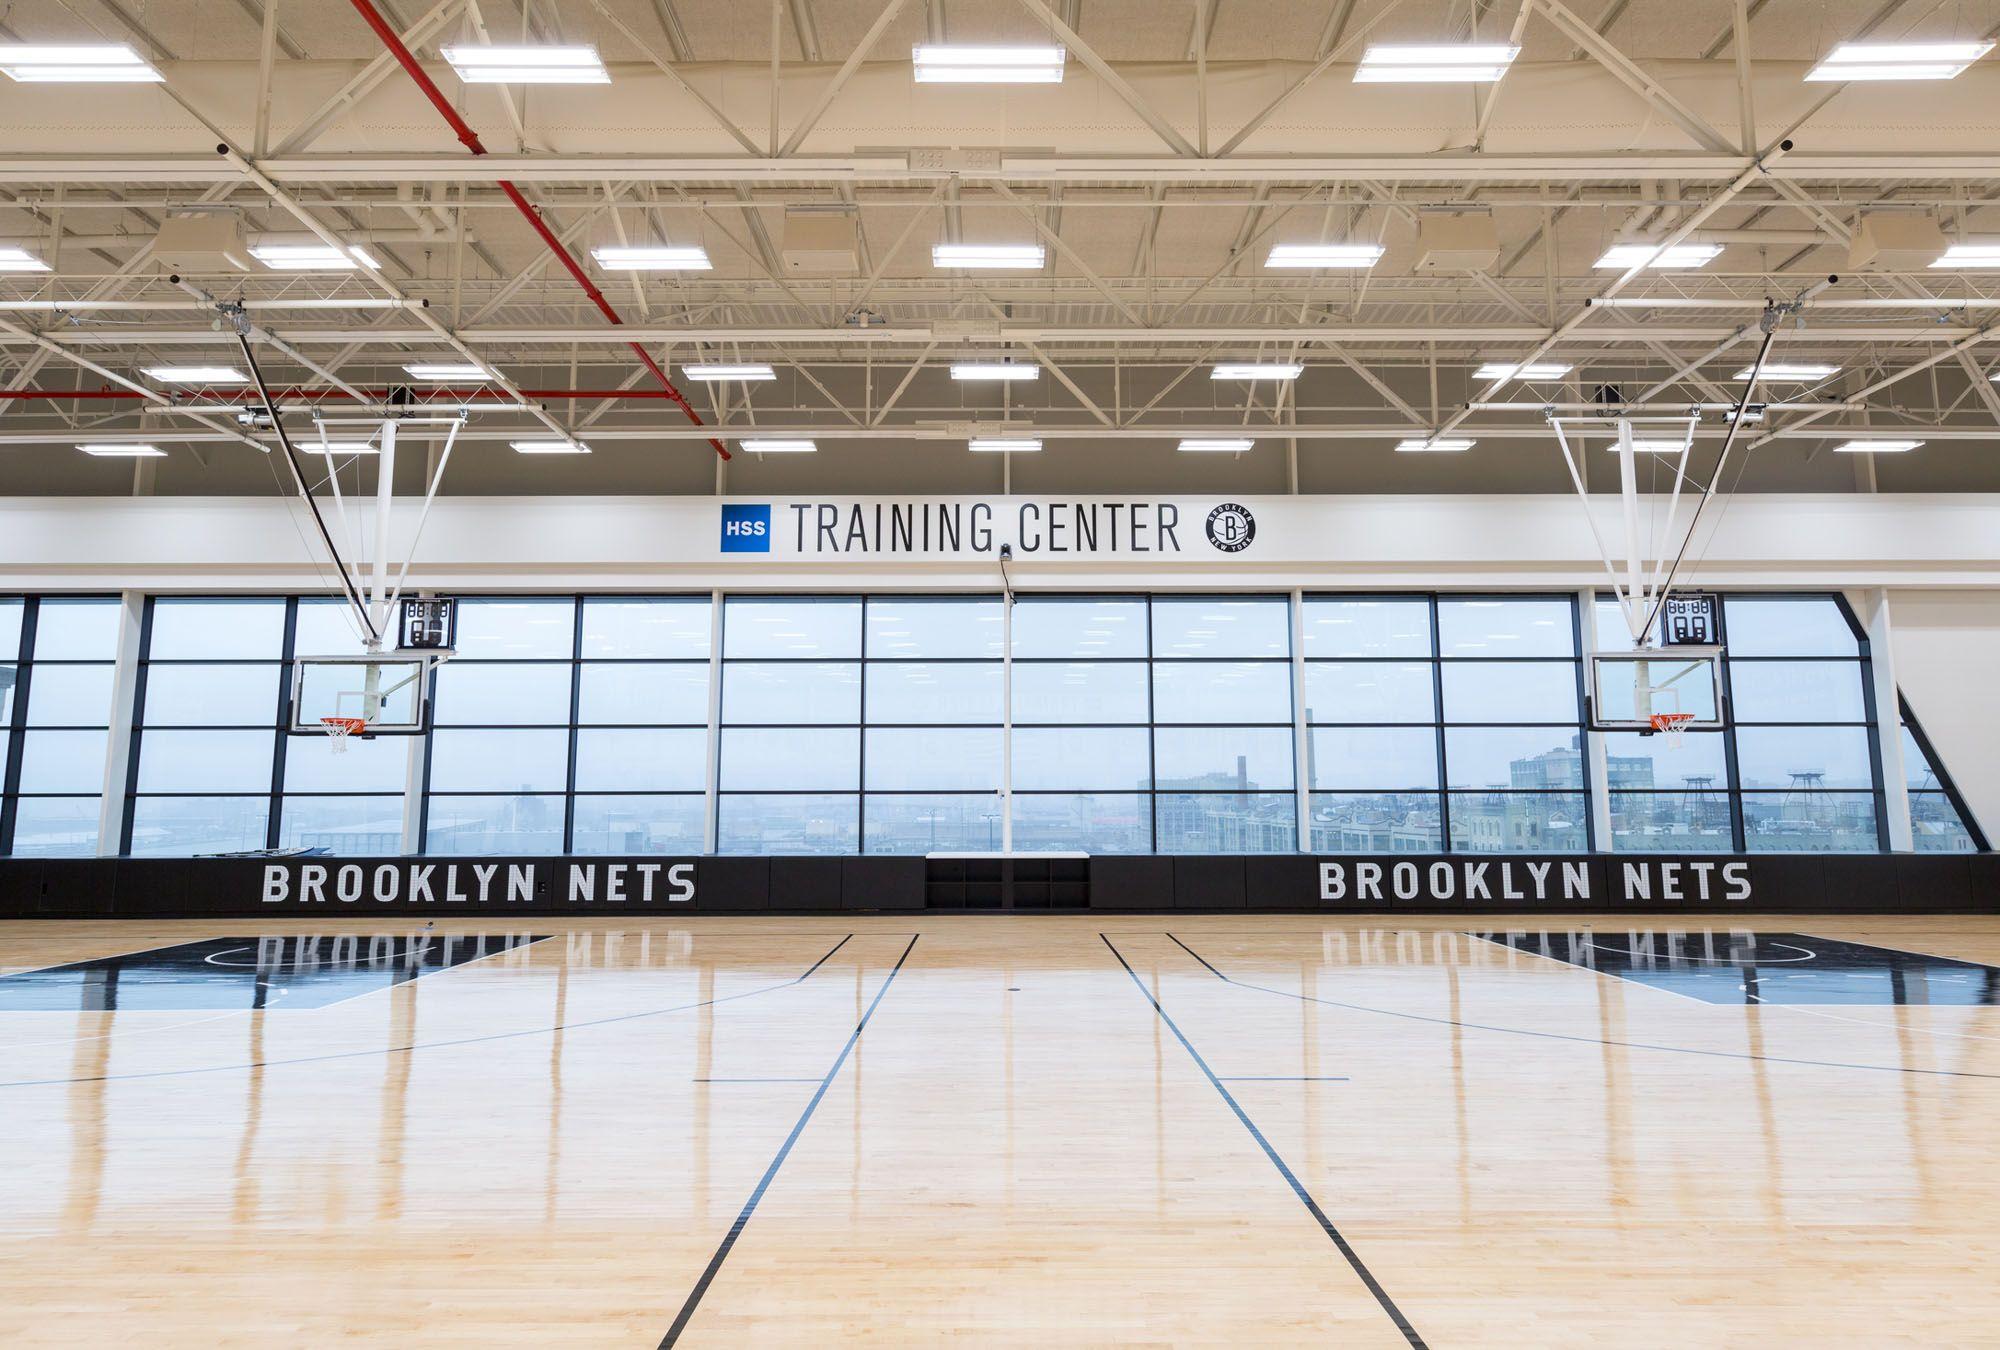 Hss Training Center Gallery Brooklyn Nets Training Center Basketball Brooklyn Nets